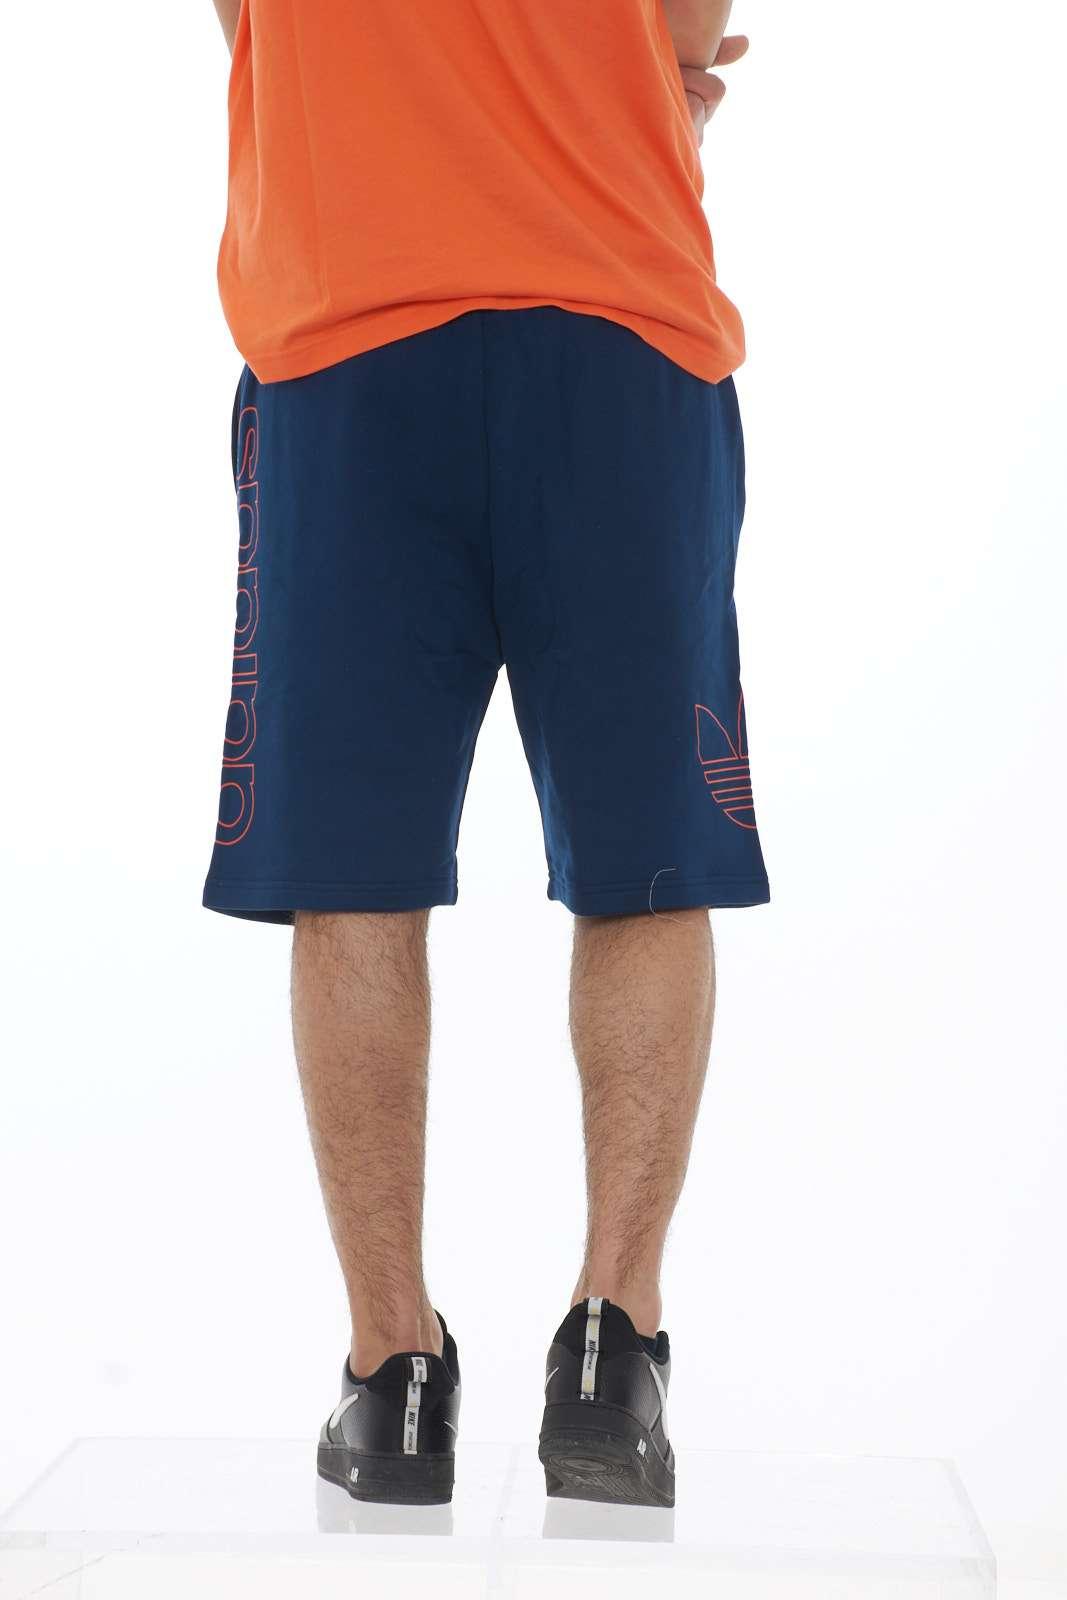 https://www.parmax.com/media/catalog/product/a/i/PE-outlet_parmax-pantaloncini-uomo-Adidas-DV3274-C.jpg